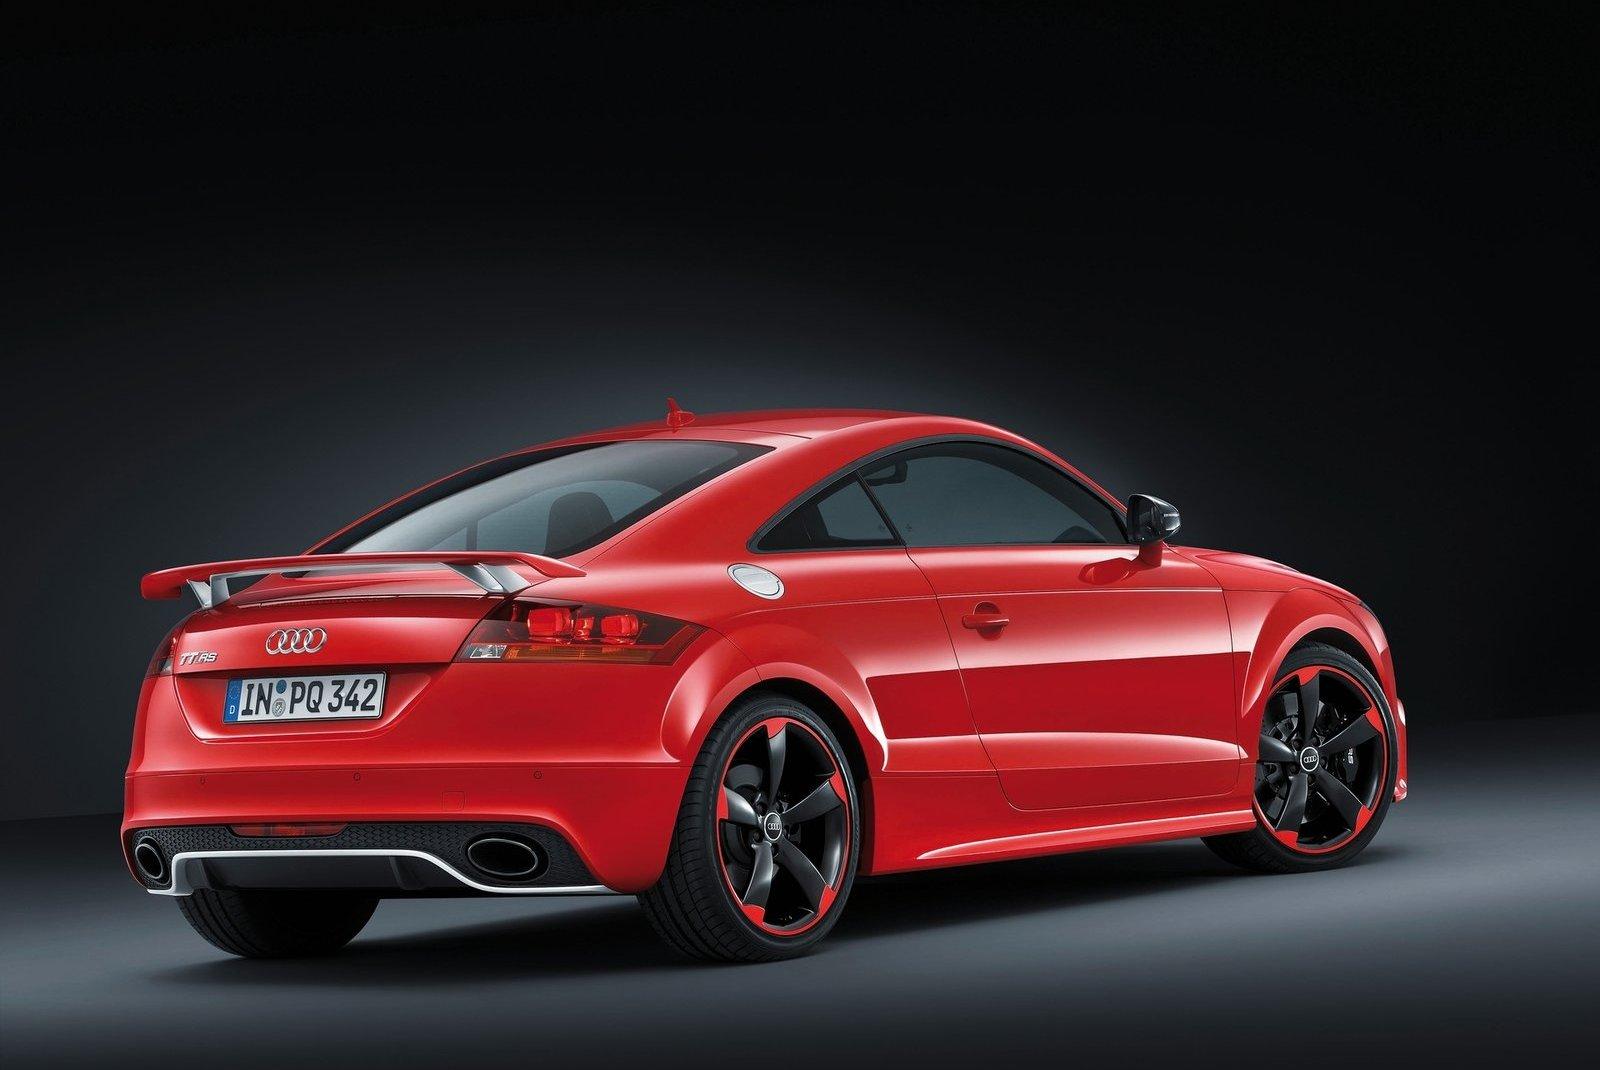 Audi TT RS Plus 7